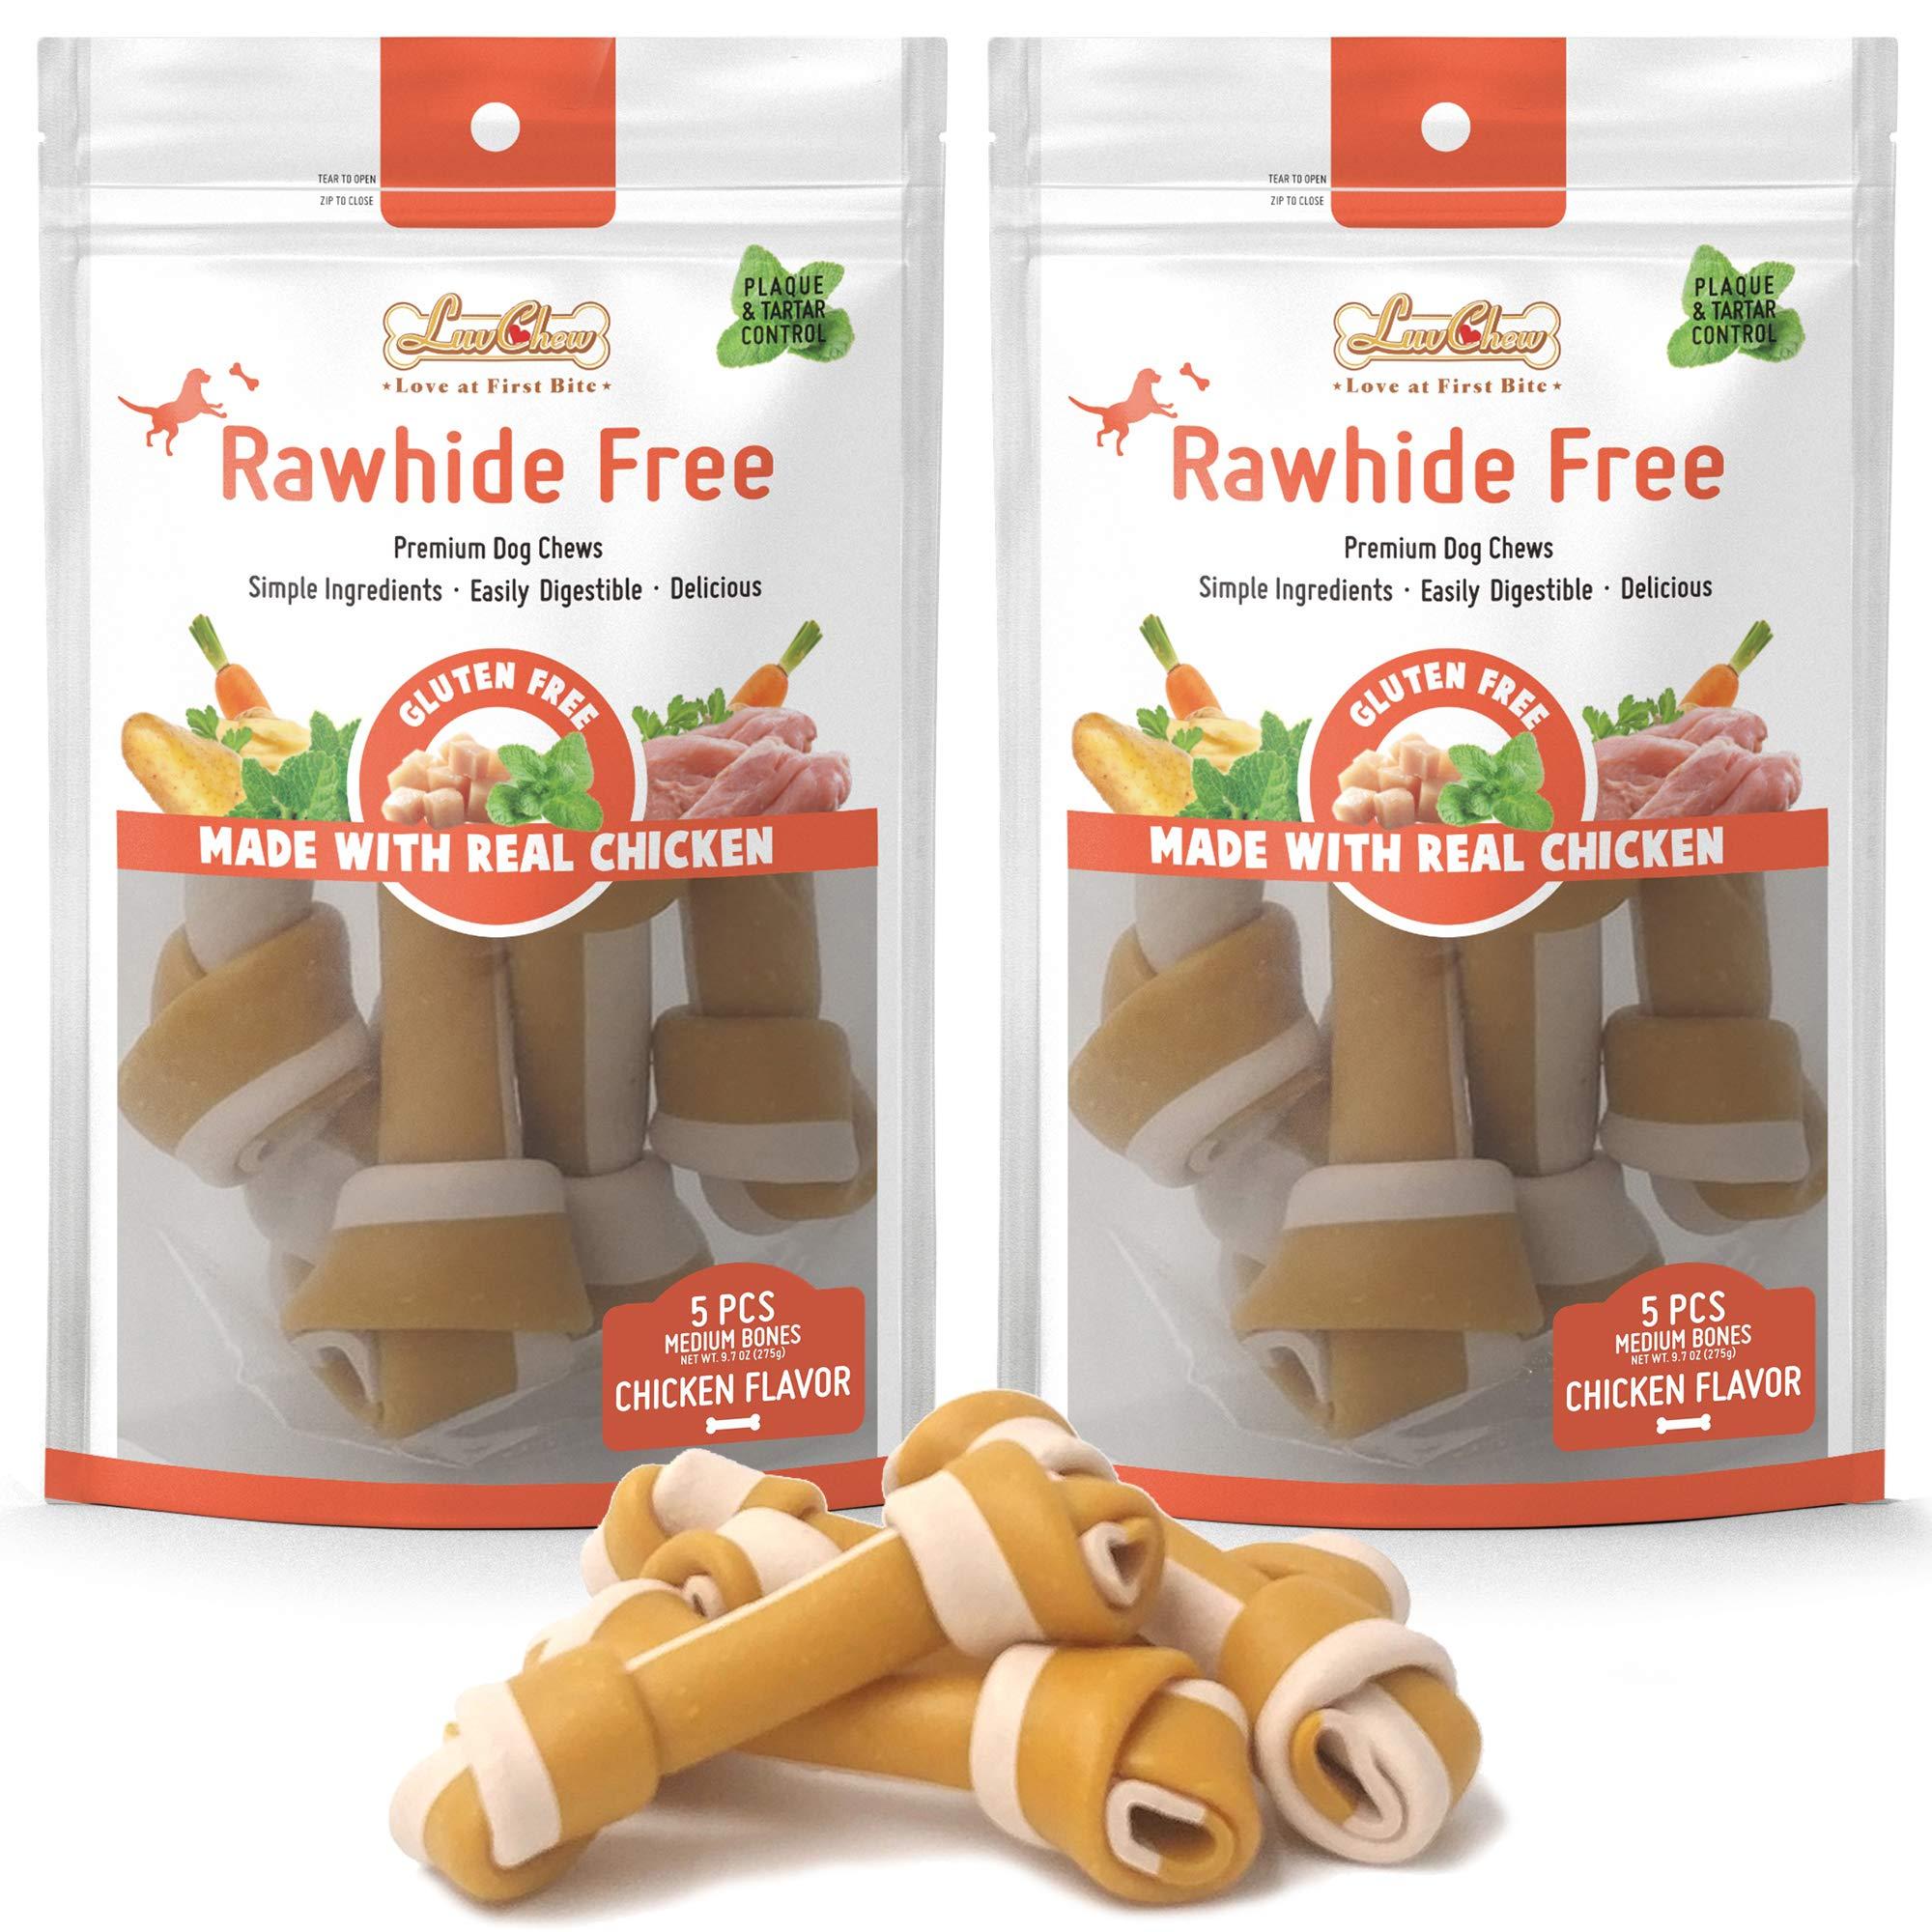 LuvChew Gluten Free Rawhide Free Chicken Bones (Medium 5pcs/Pack x 2packs) by LuvChew